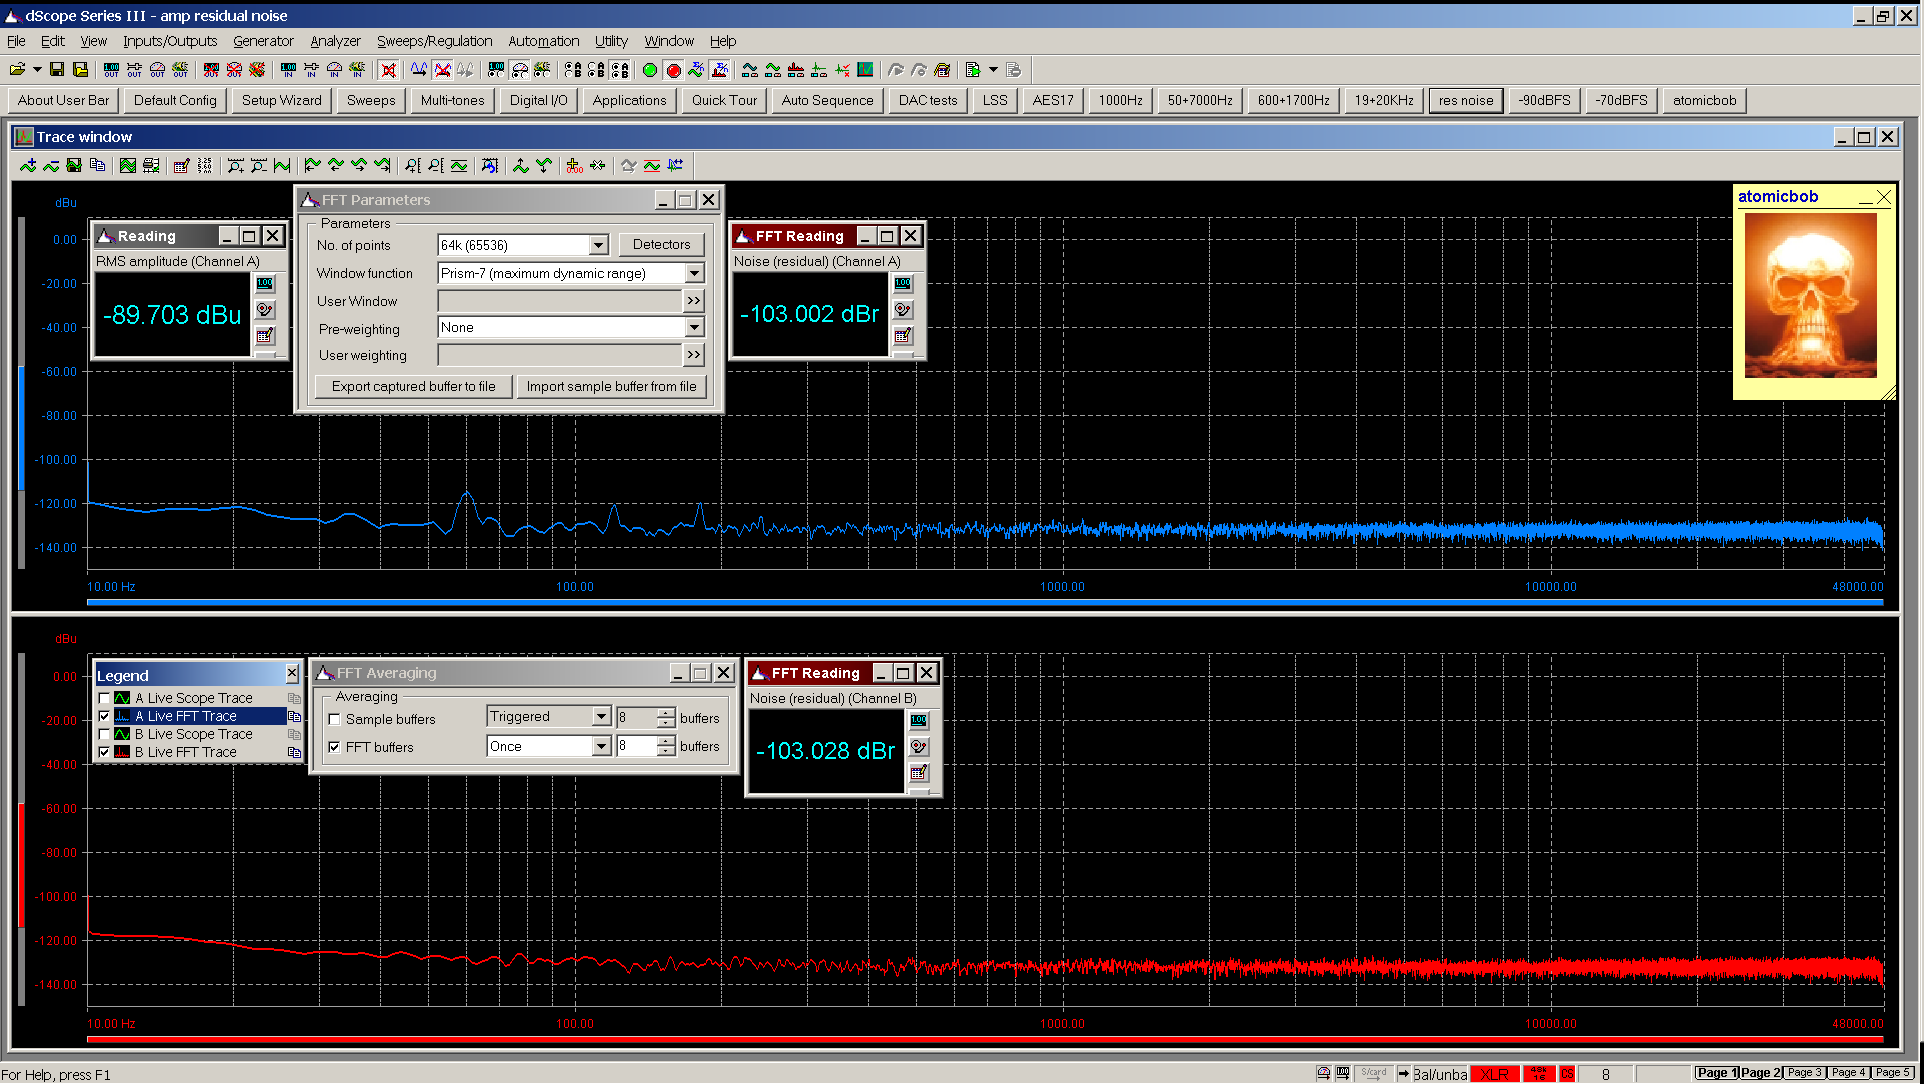 20181110-09 LiqPlat residual noise A=0dB 30R SE-4XF - LPS.png